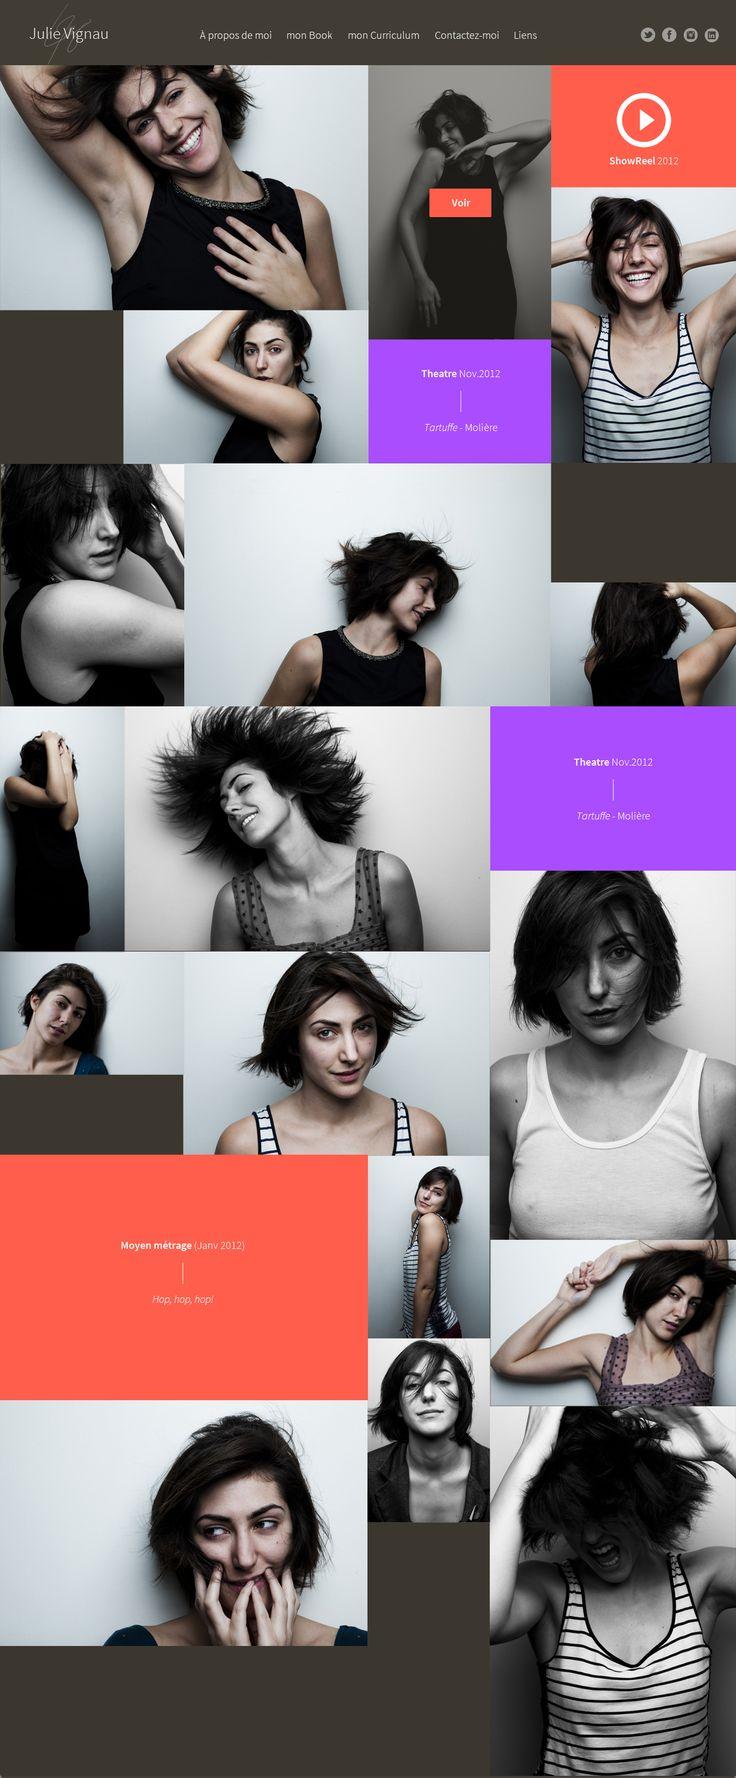 Julie—by GrafikWar | 02 Book #grid #portfolio #actress #photography #webdesign